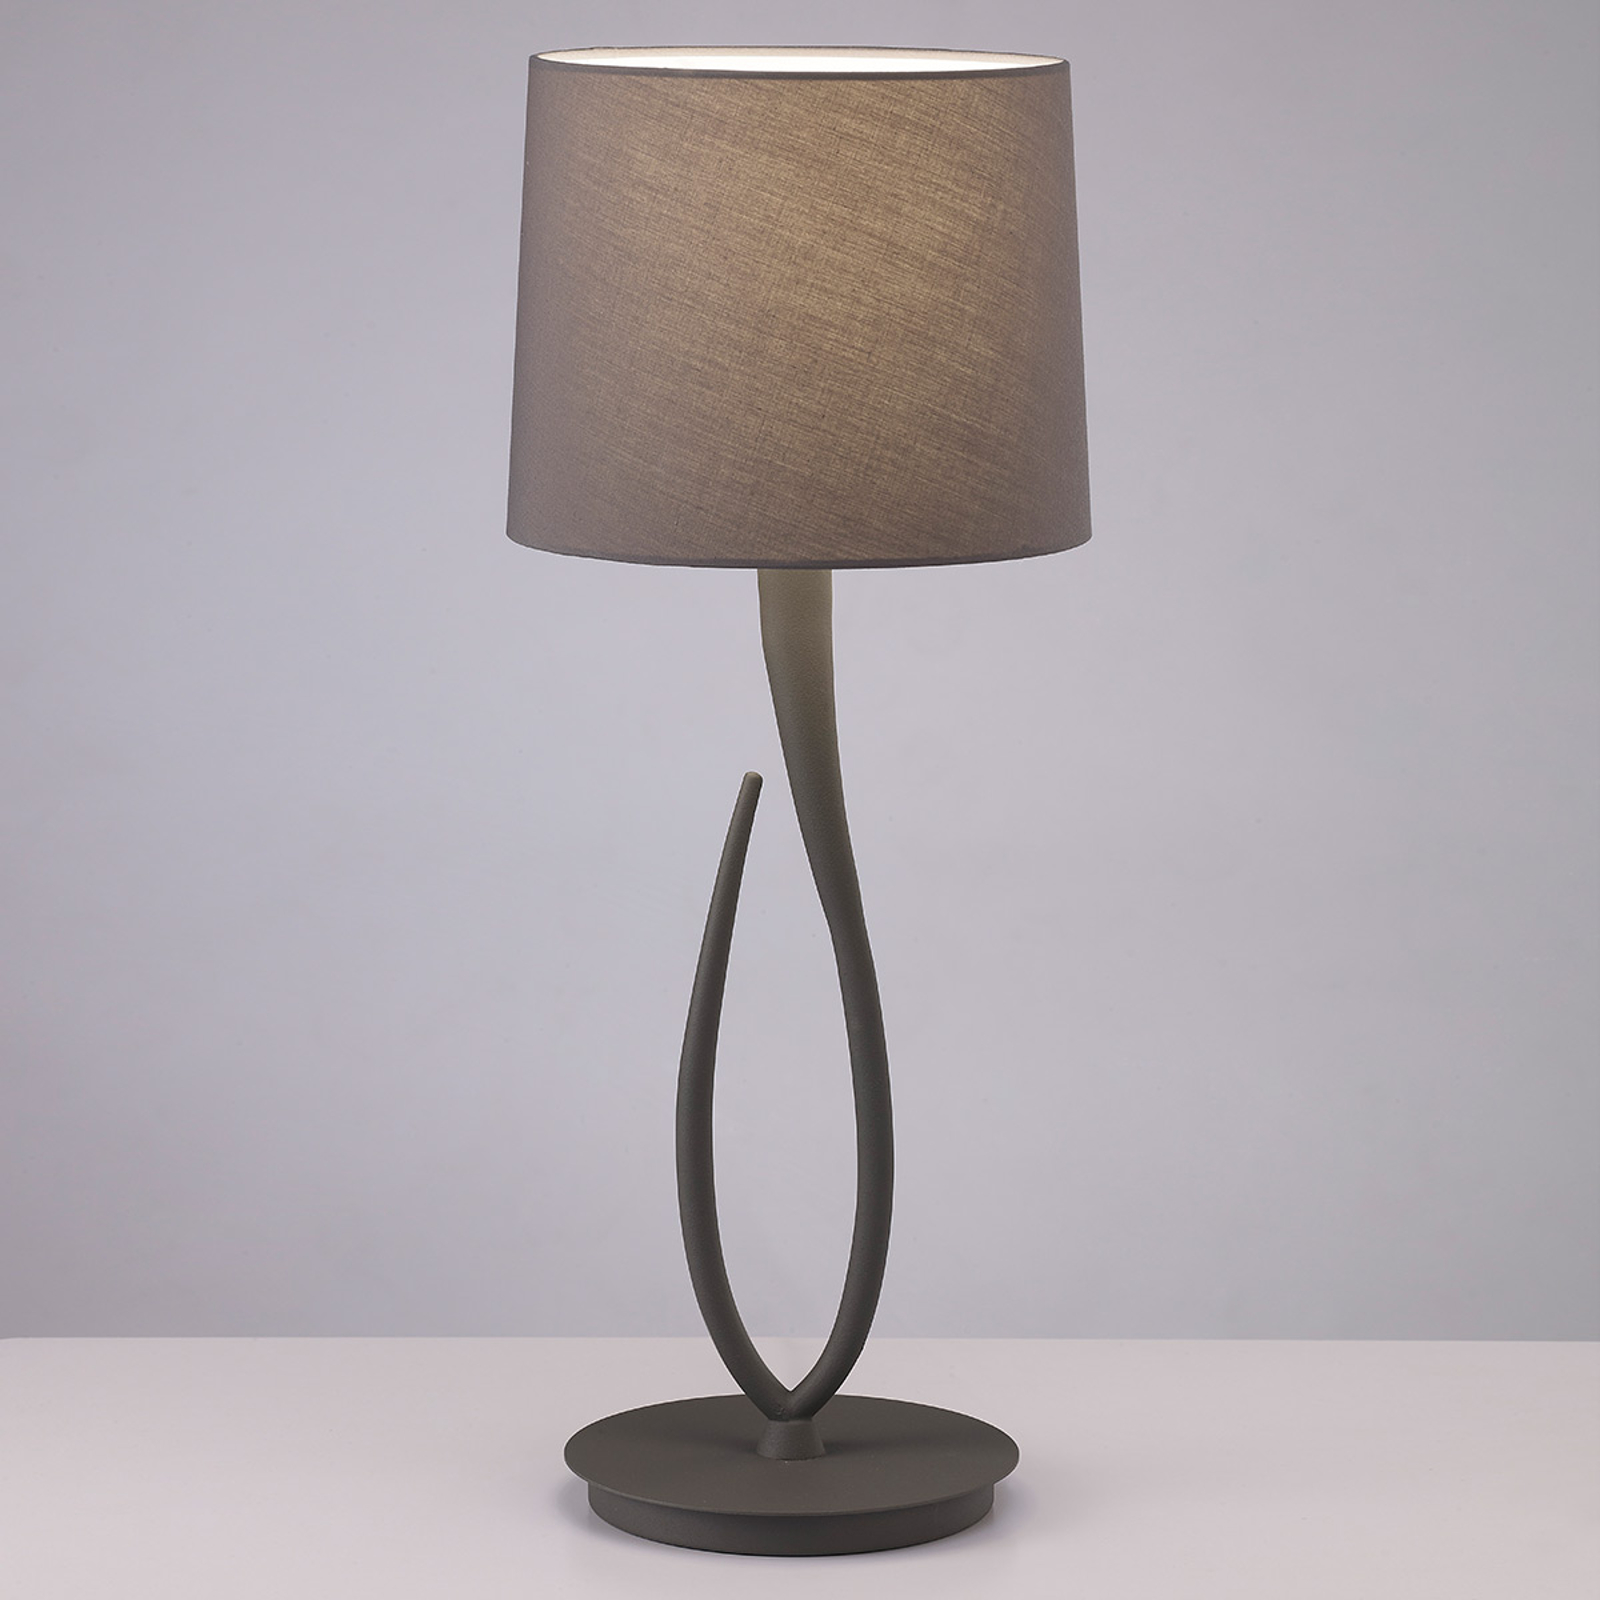 Lua - tafellamp met textiele kap, 25 cm